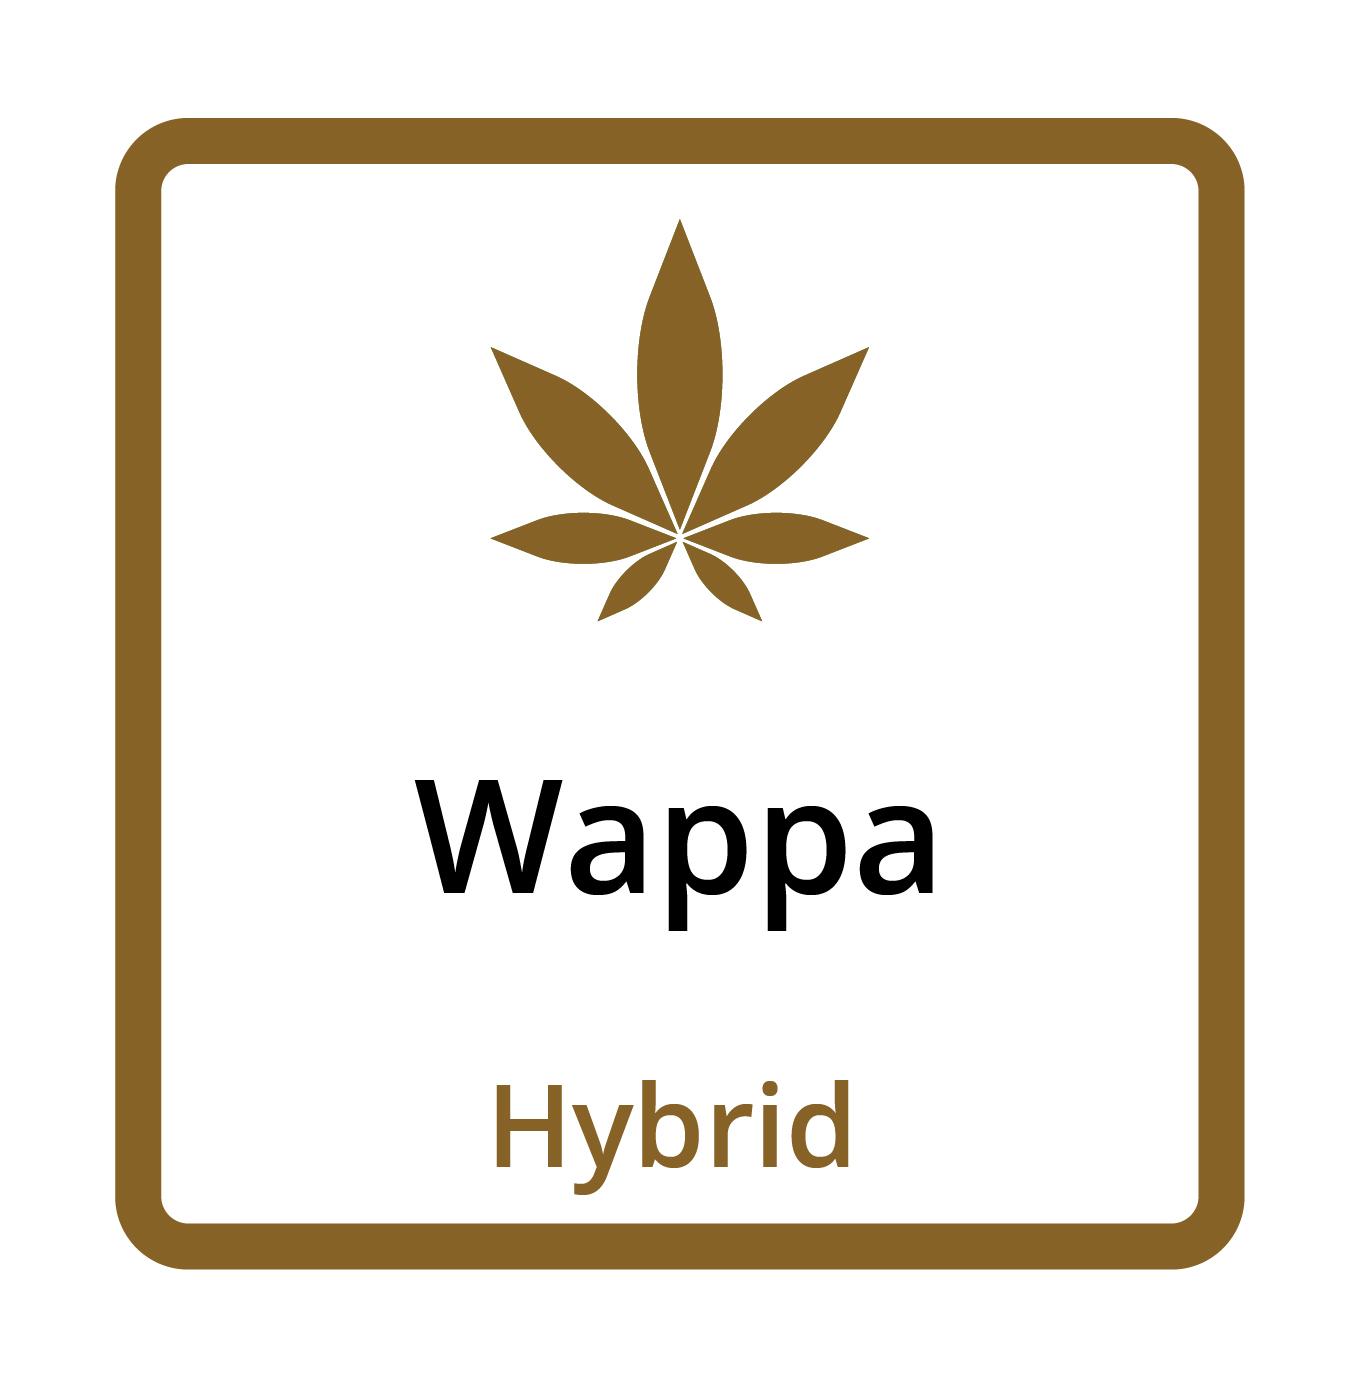 Wappa (Hybrid)